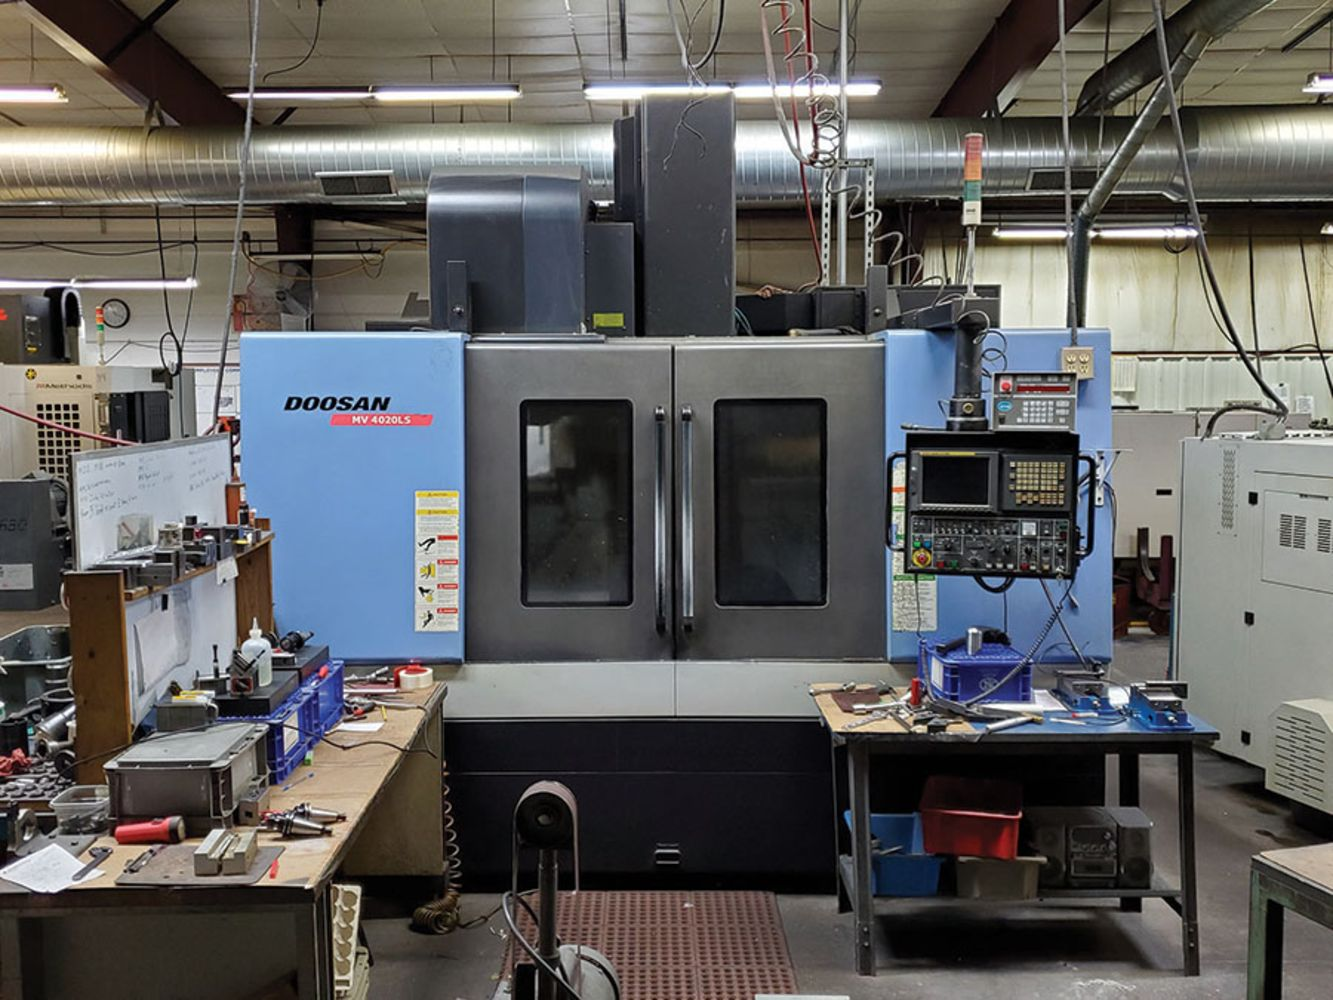 VECTOR - (16) CNC Machines, (9) Automatic Screw Machines, Toolroom Equipment